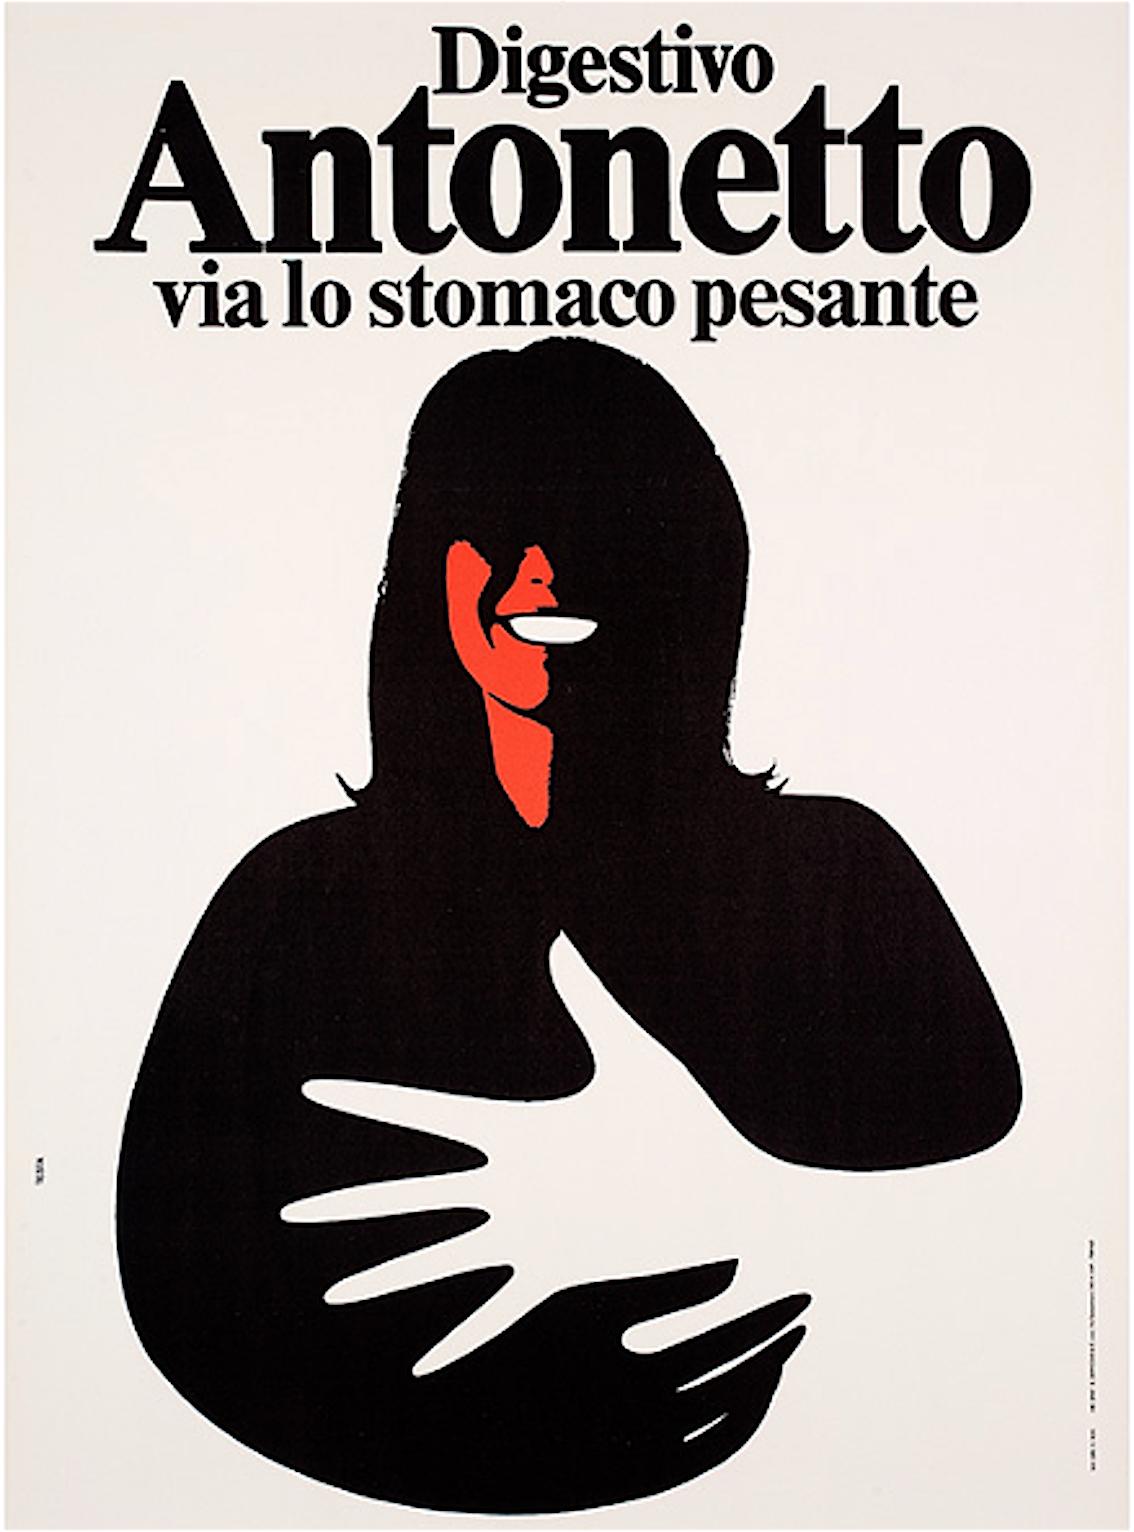 digestivo antonetto